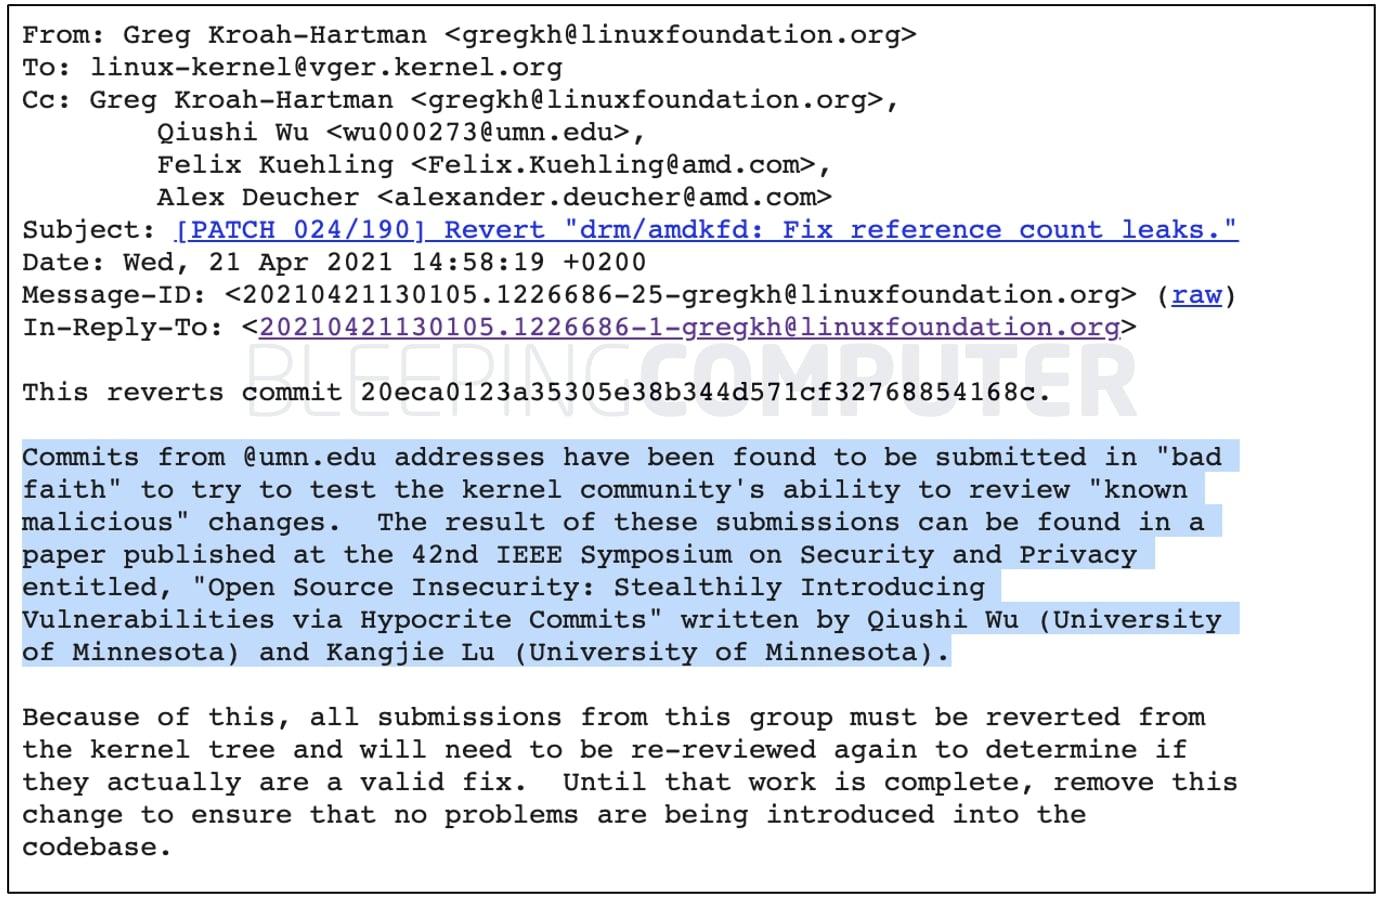 emails from Greg Kroah-Hartman